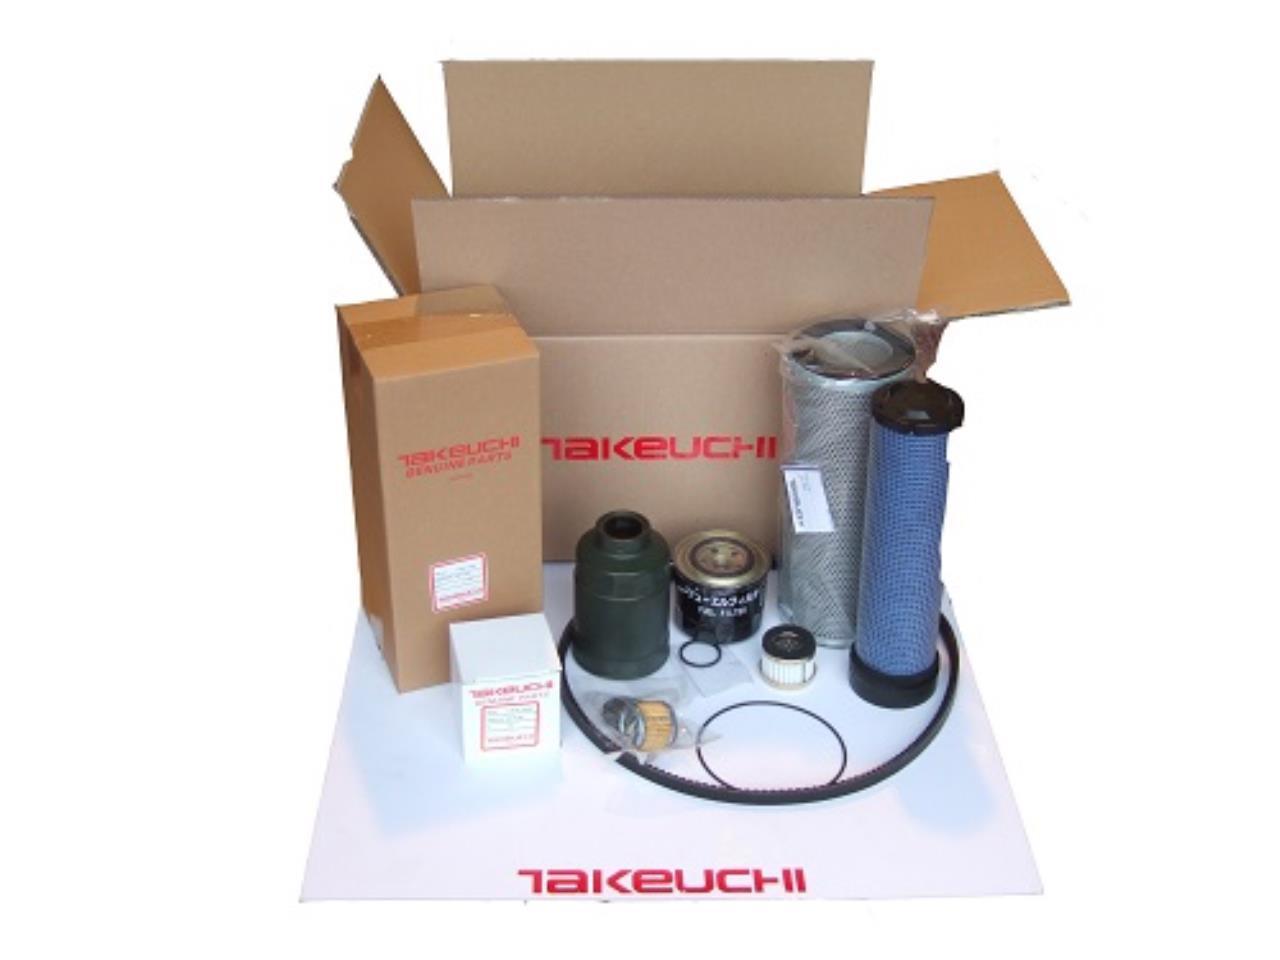 Takeuchi TB290 filtersæt m/Isuzu motor